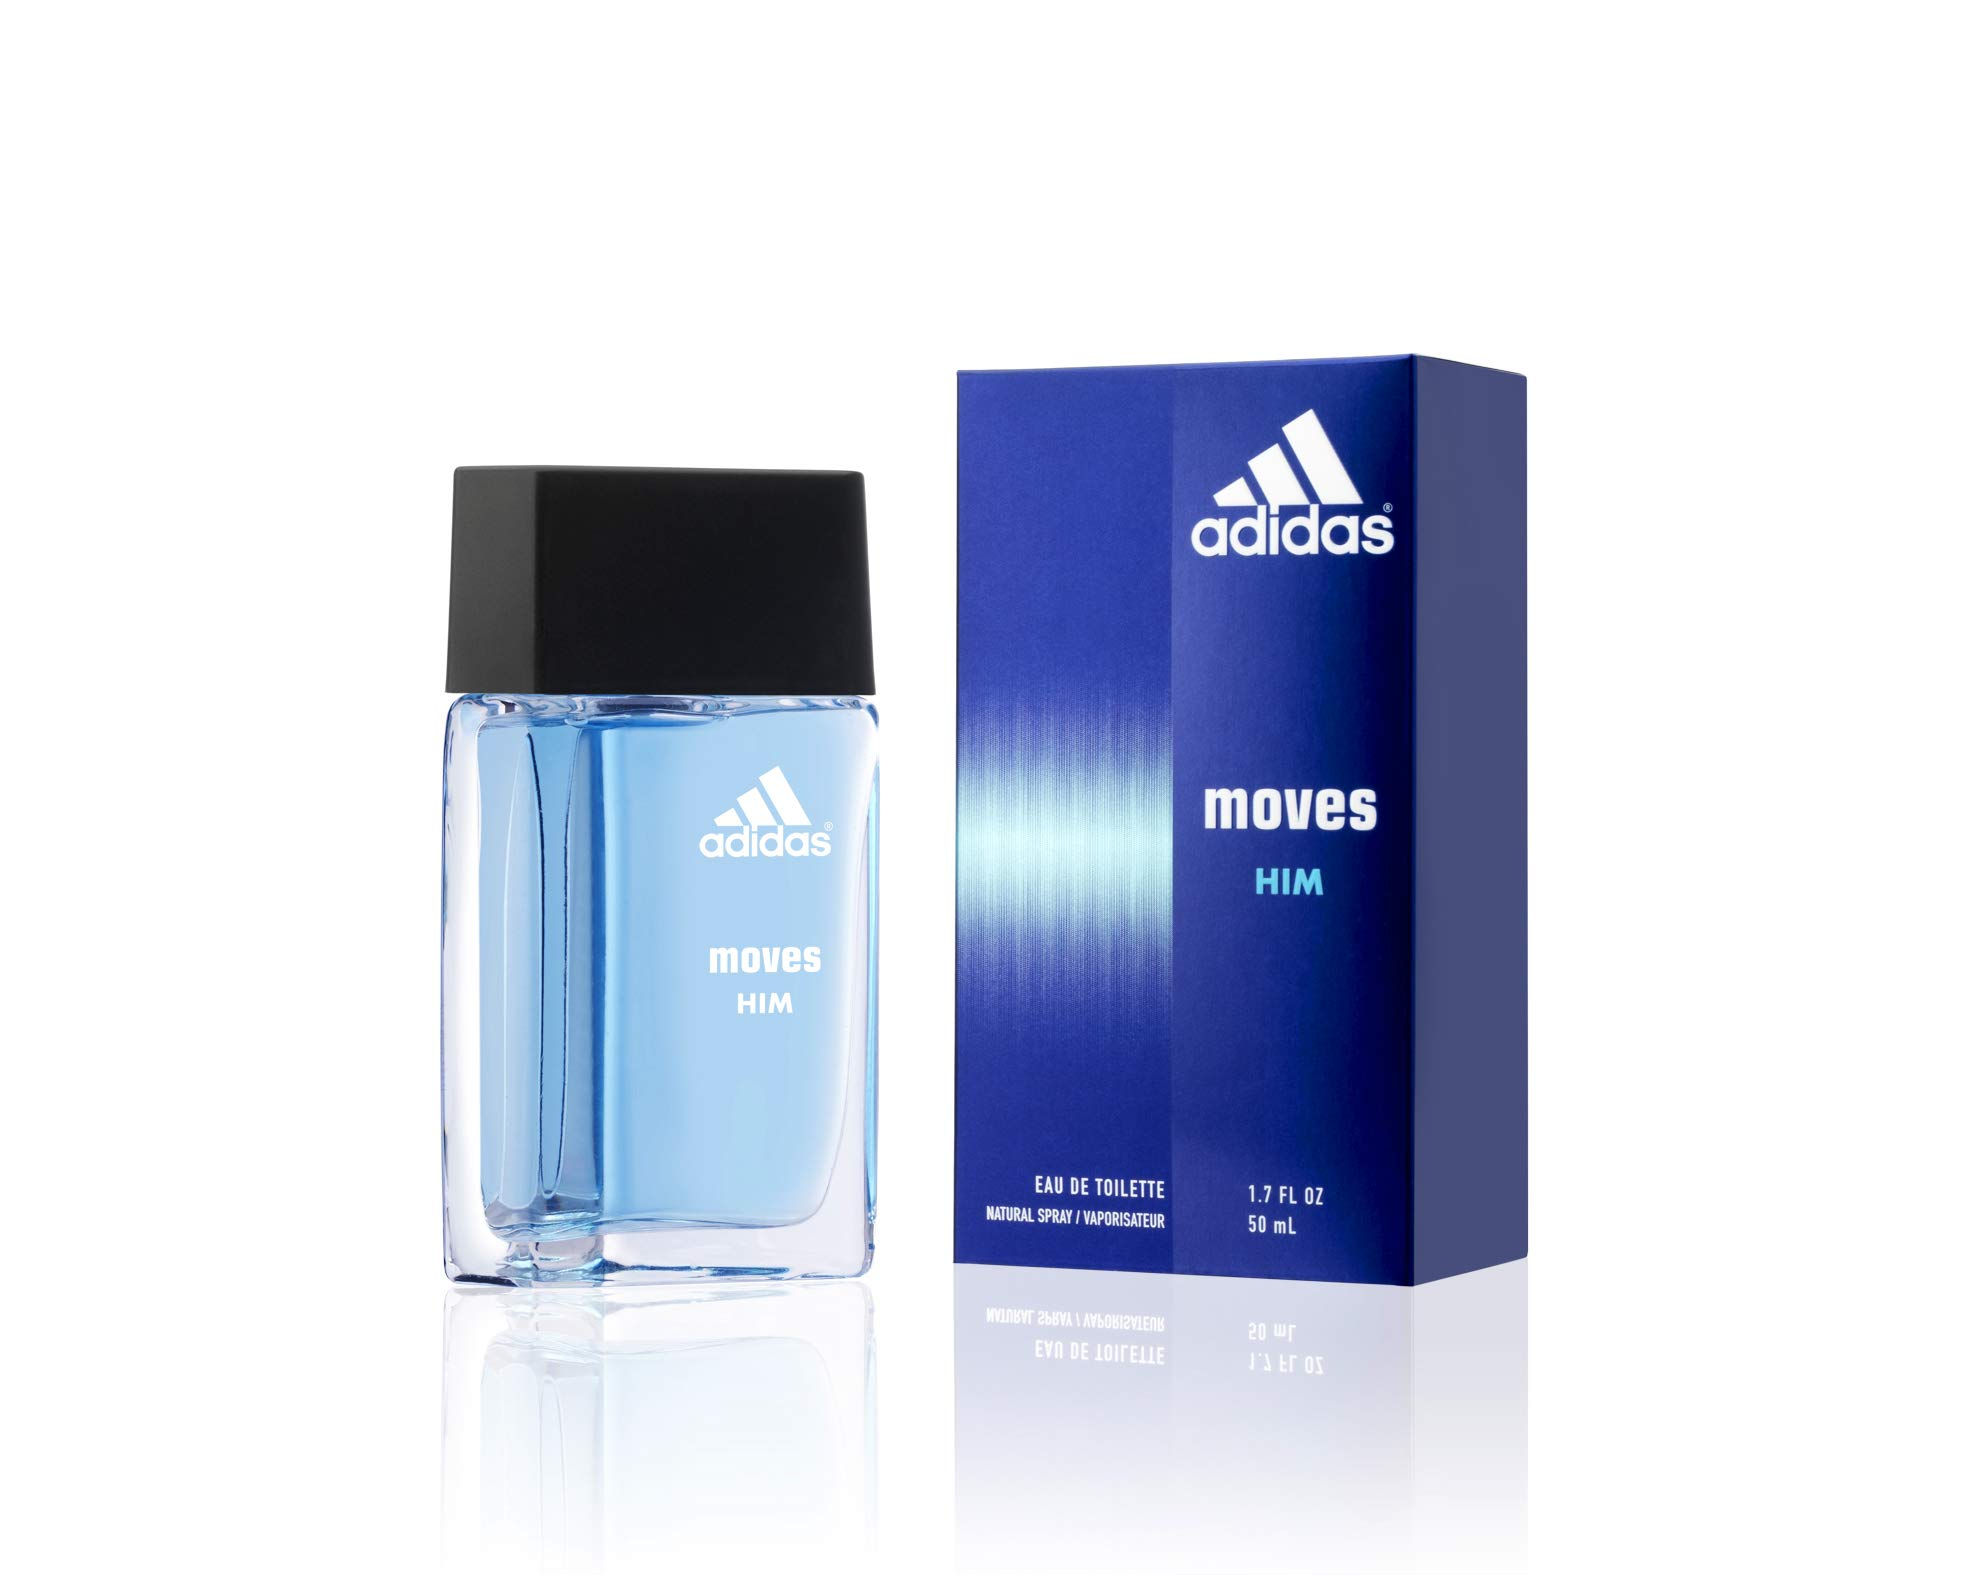 Adidas Moves for Men Eau de Toilette Spray 1.7 oz by adidas